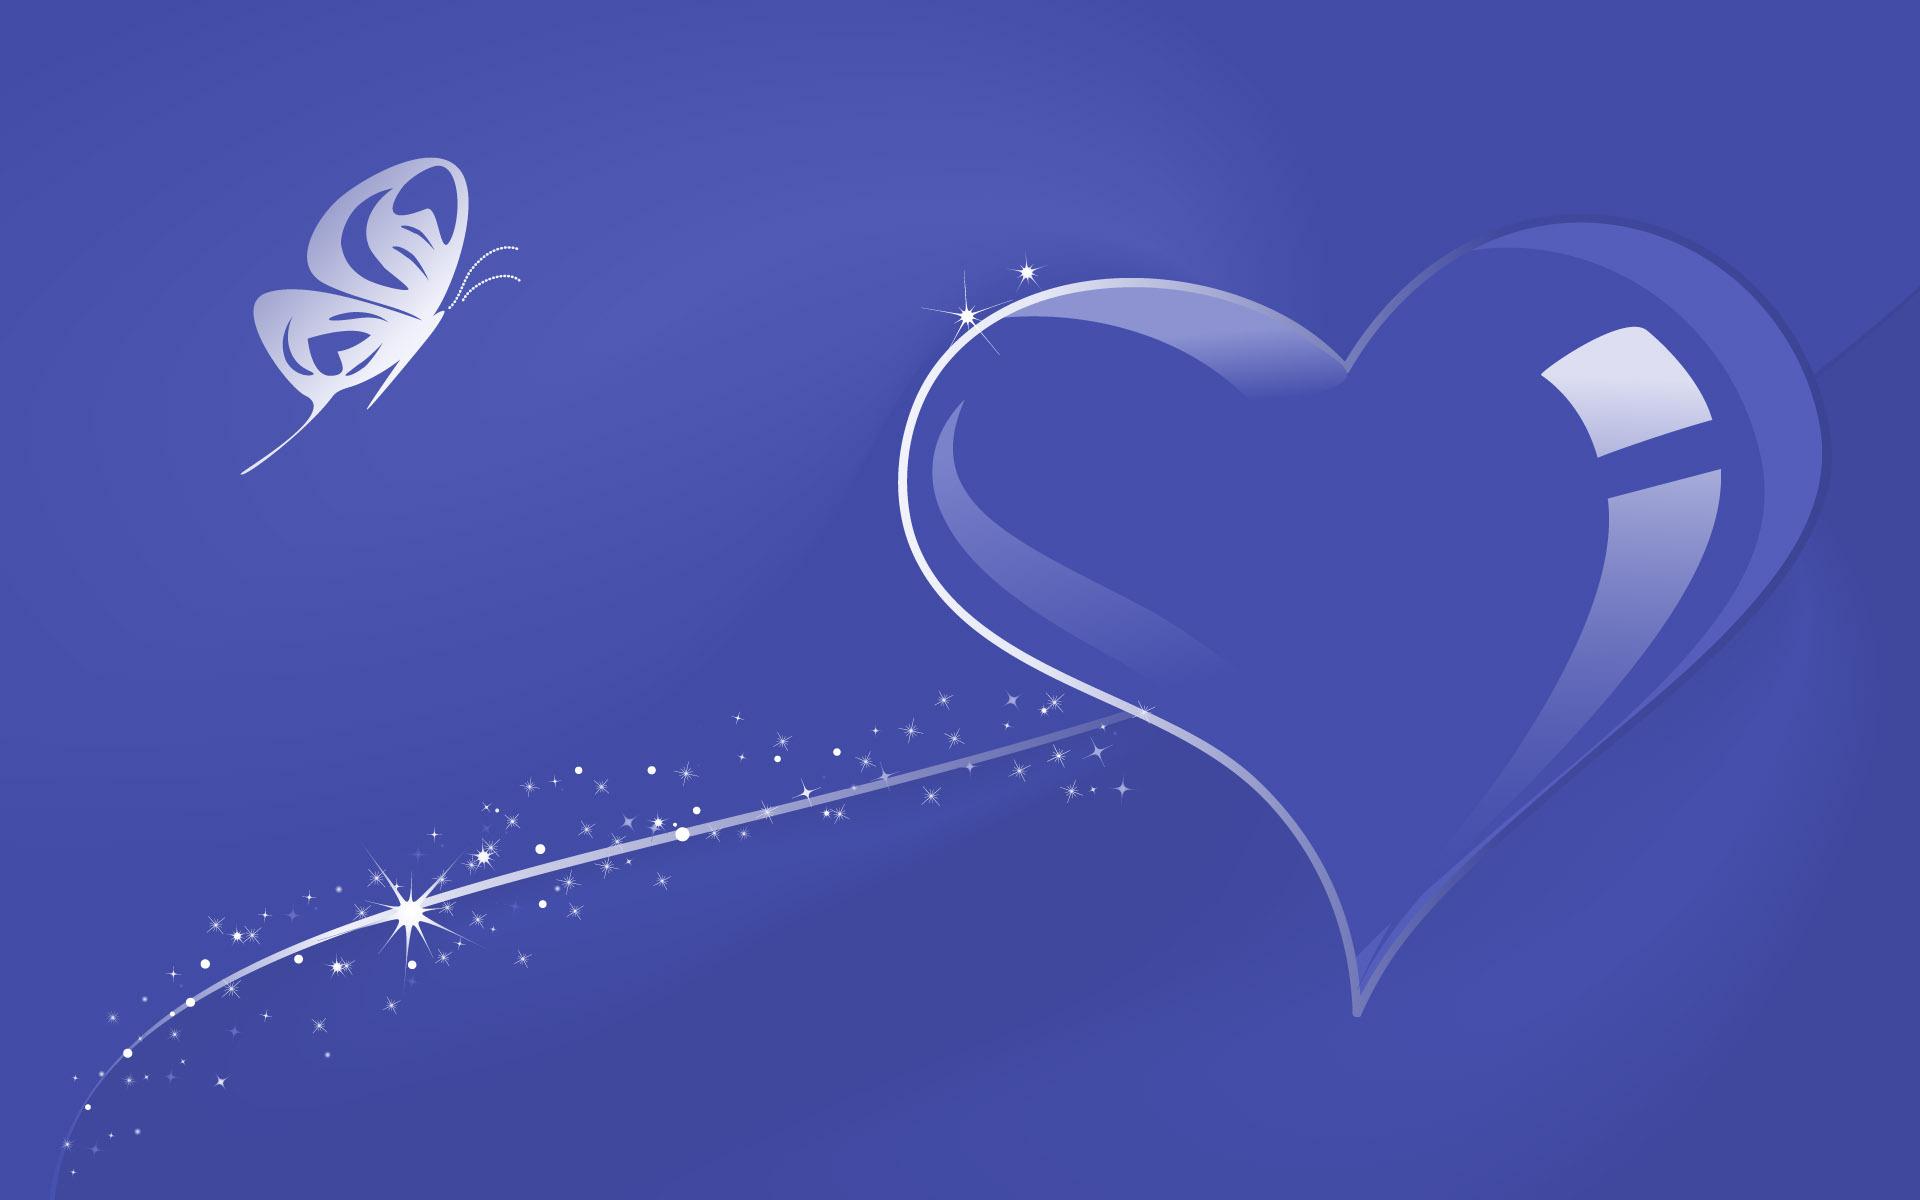 Love Design 5 WallPaper HD - http://imashon com/love/love-design-5